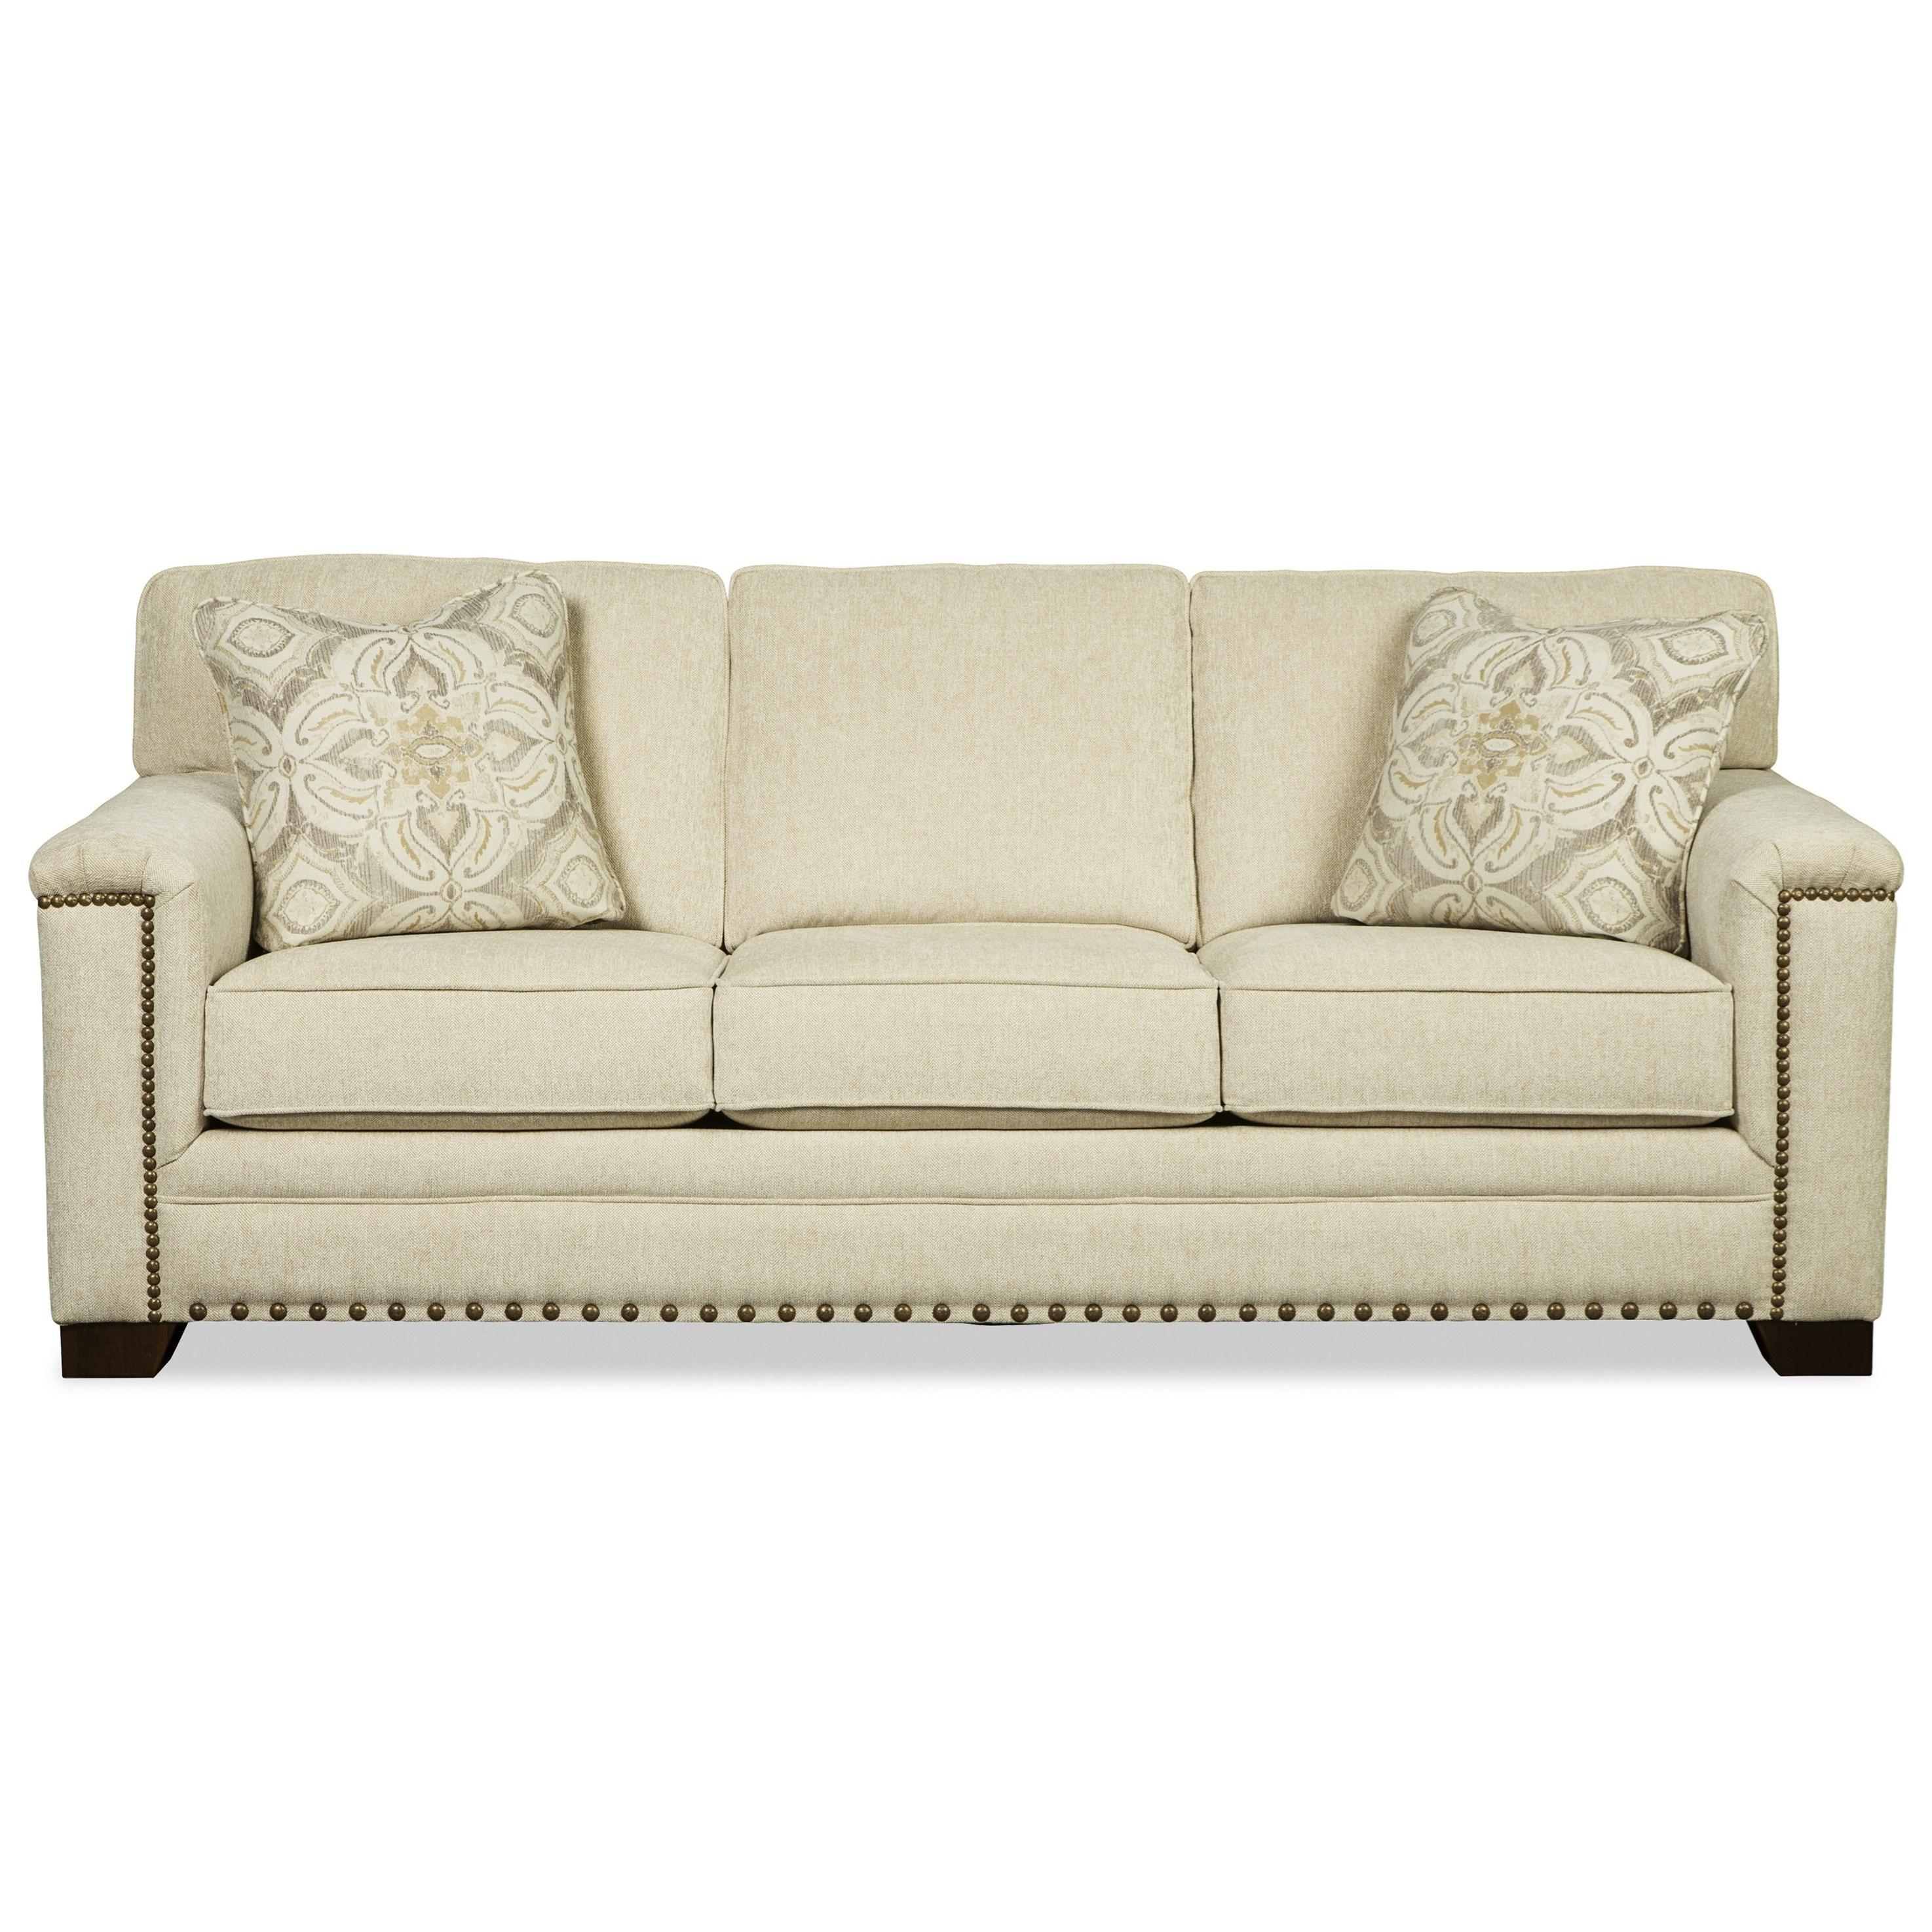 Awe Inspiring Craftmaster 781950 781950 98 Transitional Queen Sleeper Sofa Ibusinesslaw Wood Chair Design Ideas Ibusinesslaworg